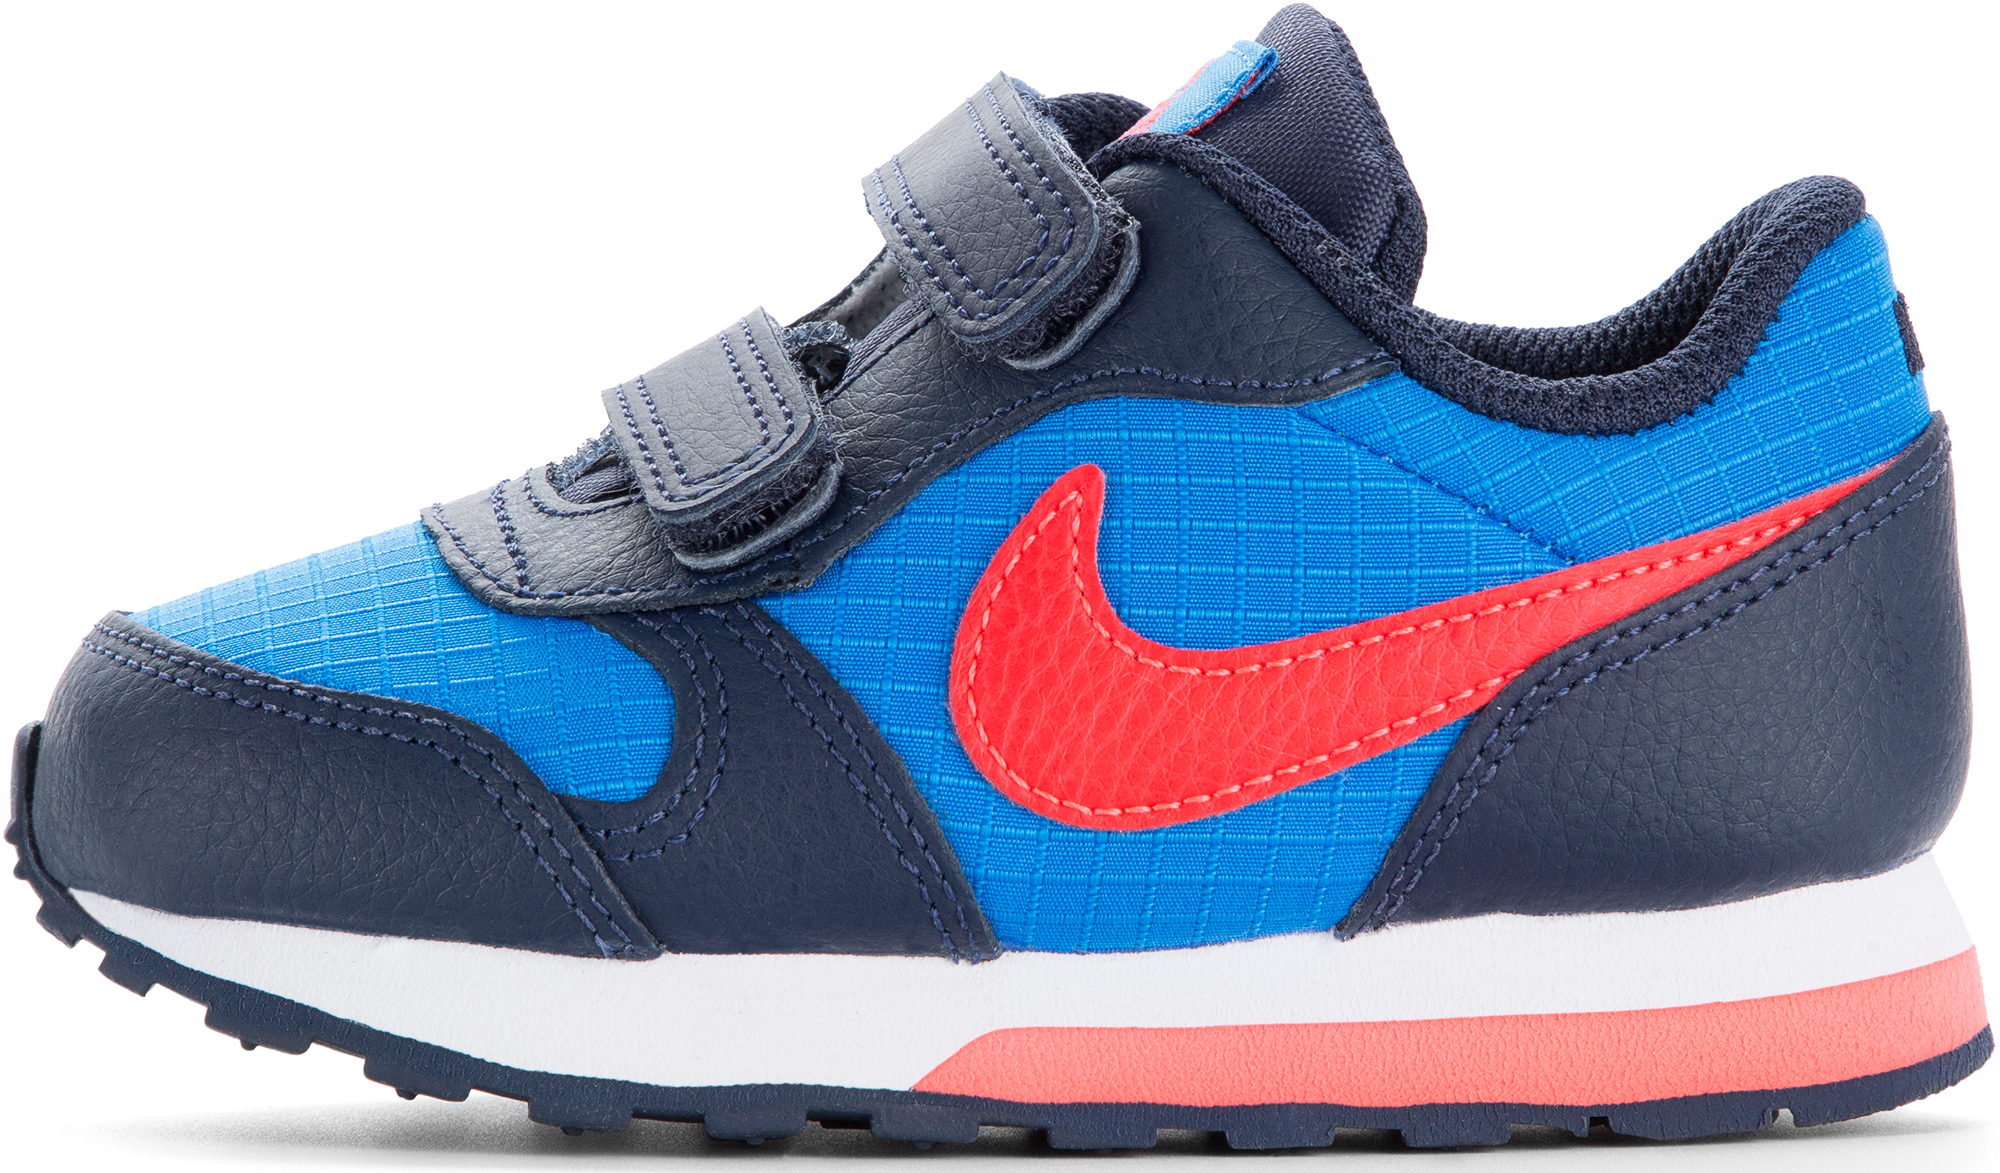 Nike Кроссовки для мальчиков Nike MD Runner 2, размер 22,5 nike кроссовки для мальчиков nike lunar hayward размер 37 5